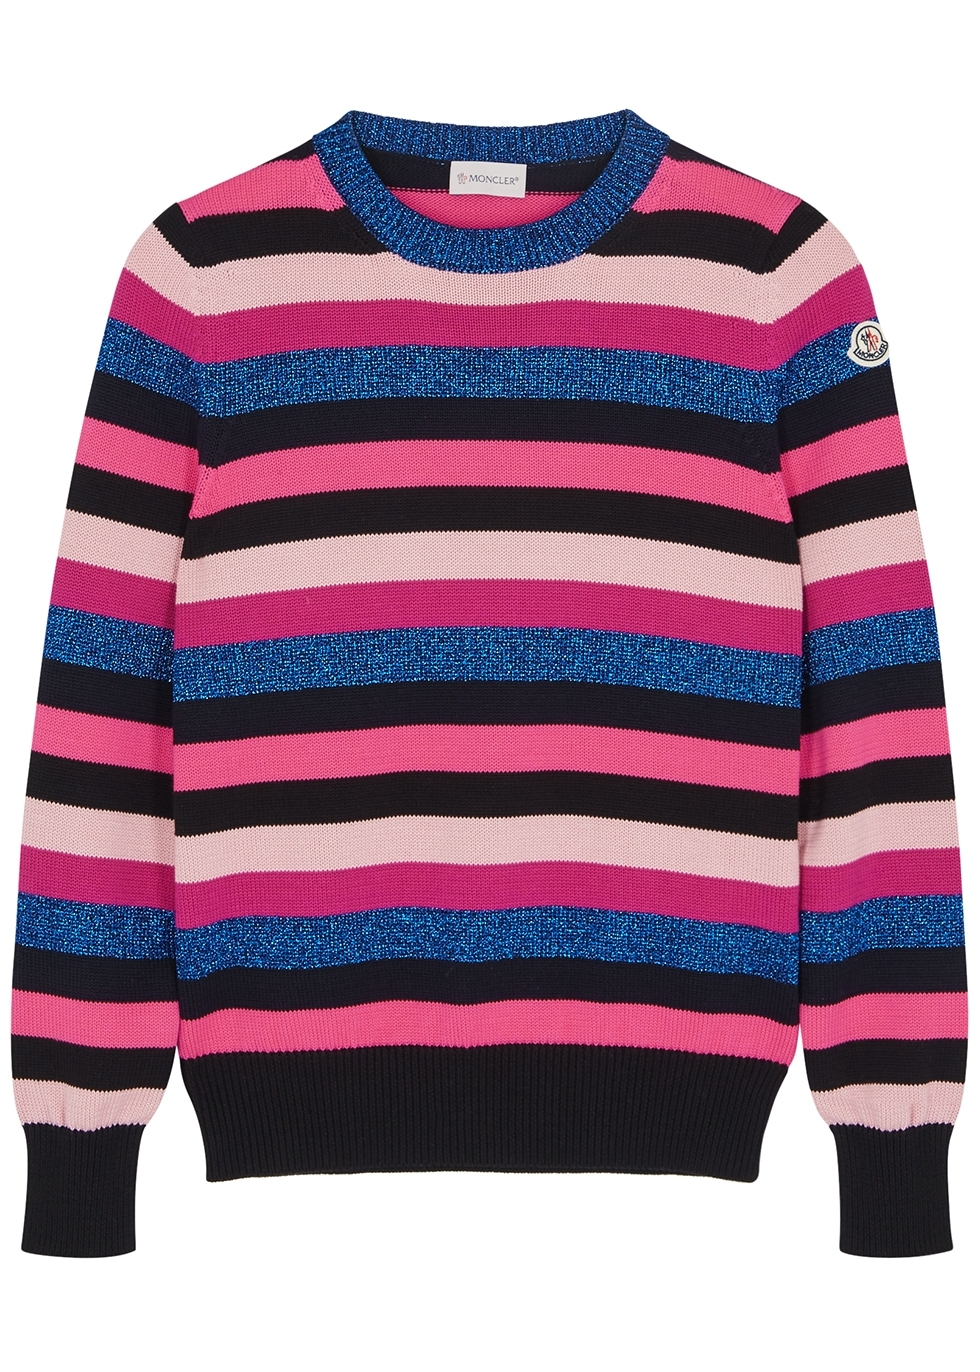 294e952b76c2 Moncler - Womens - Harvey Nichols